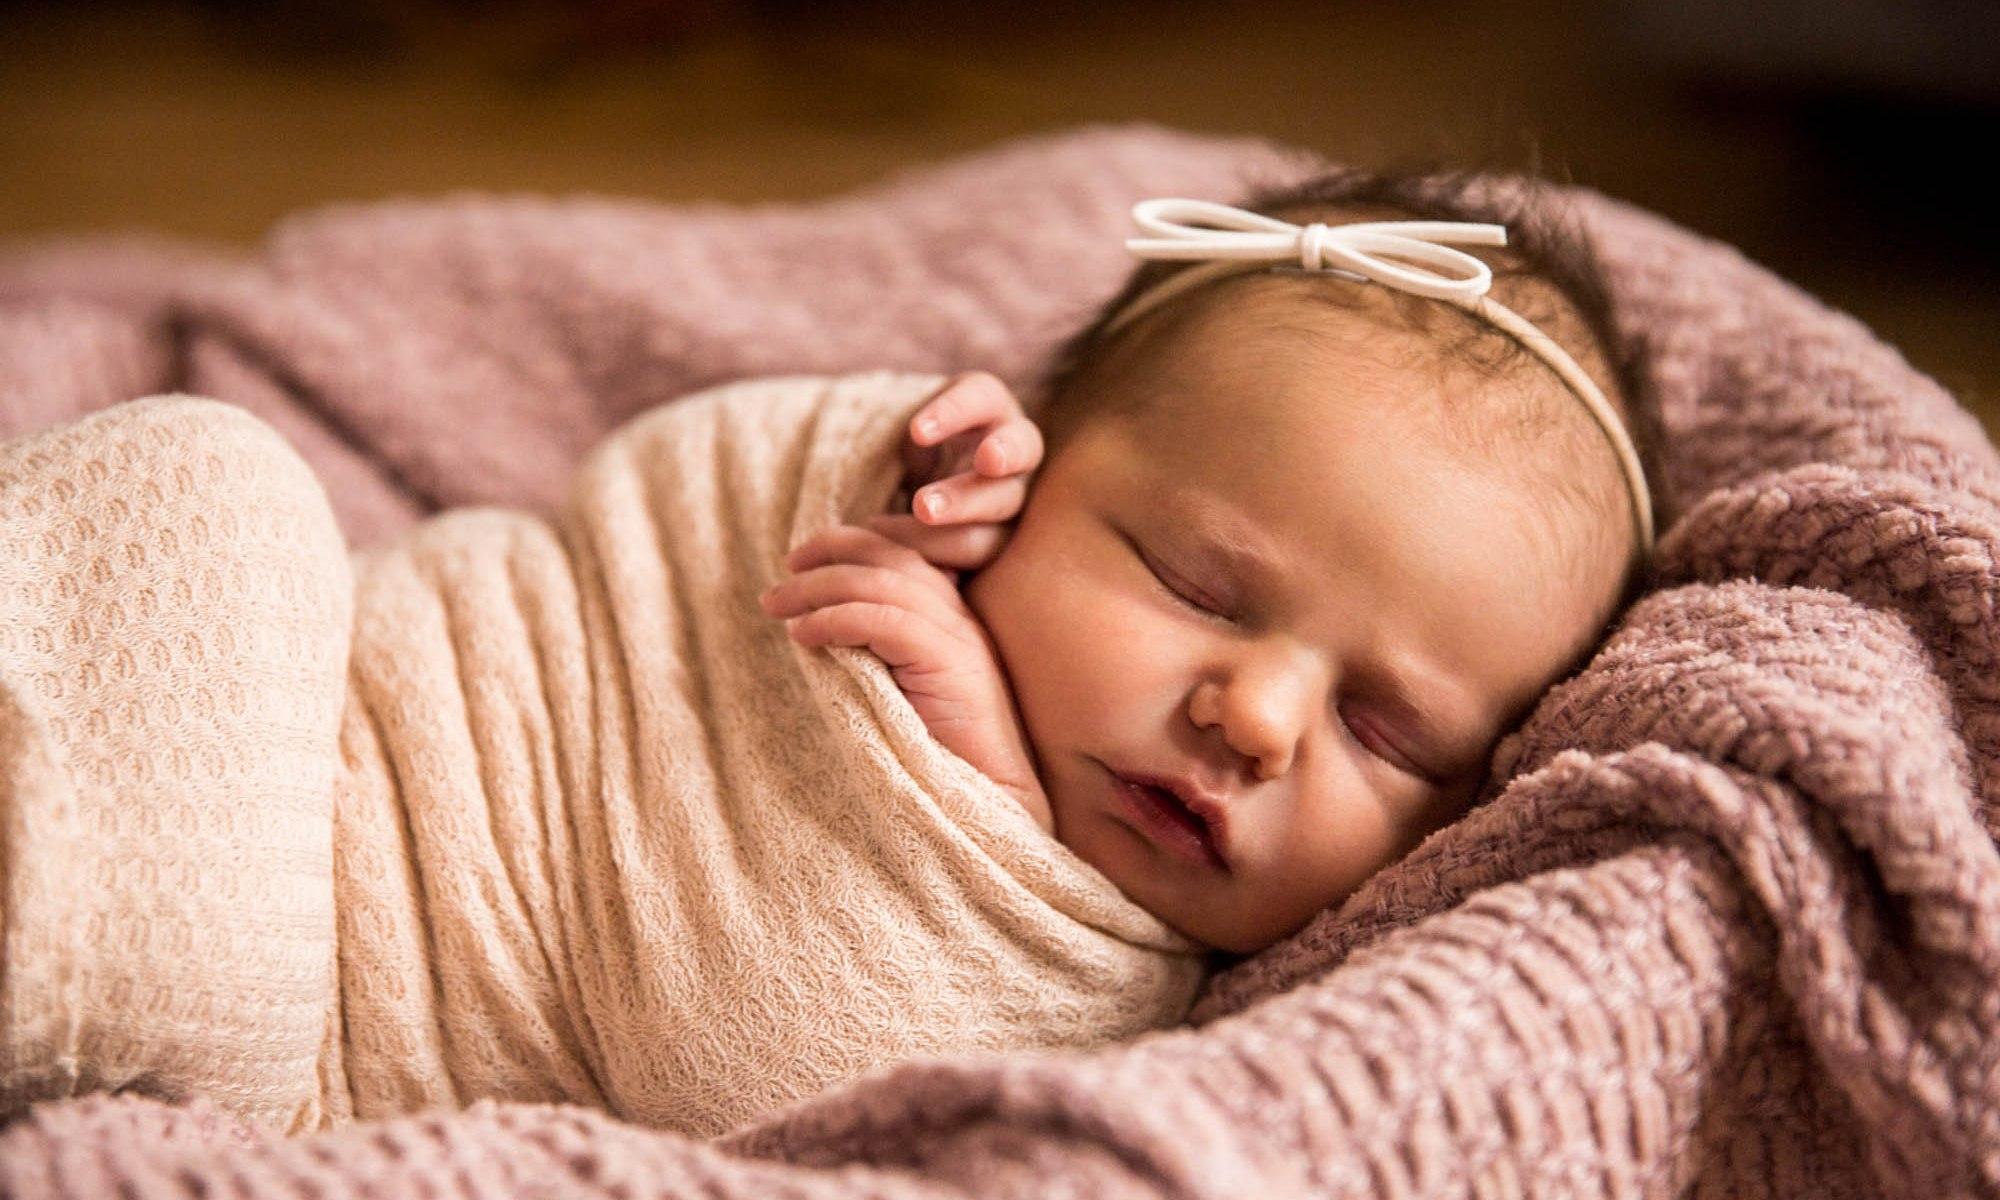 Calgary family photographer - in-home lifestyle newborn photography